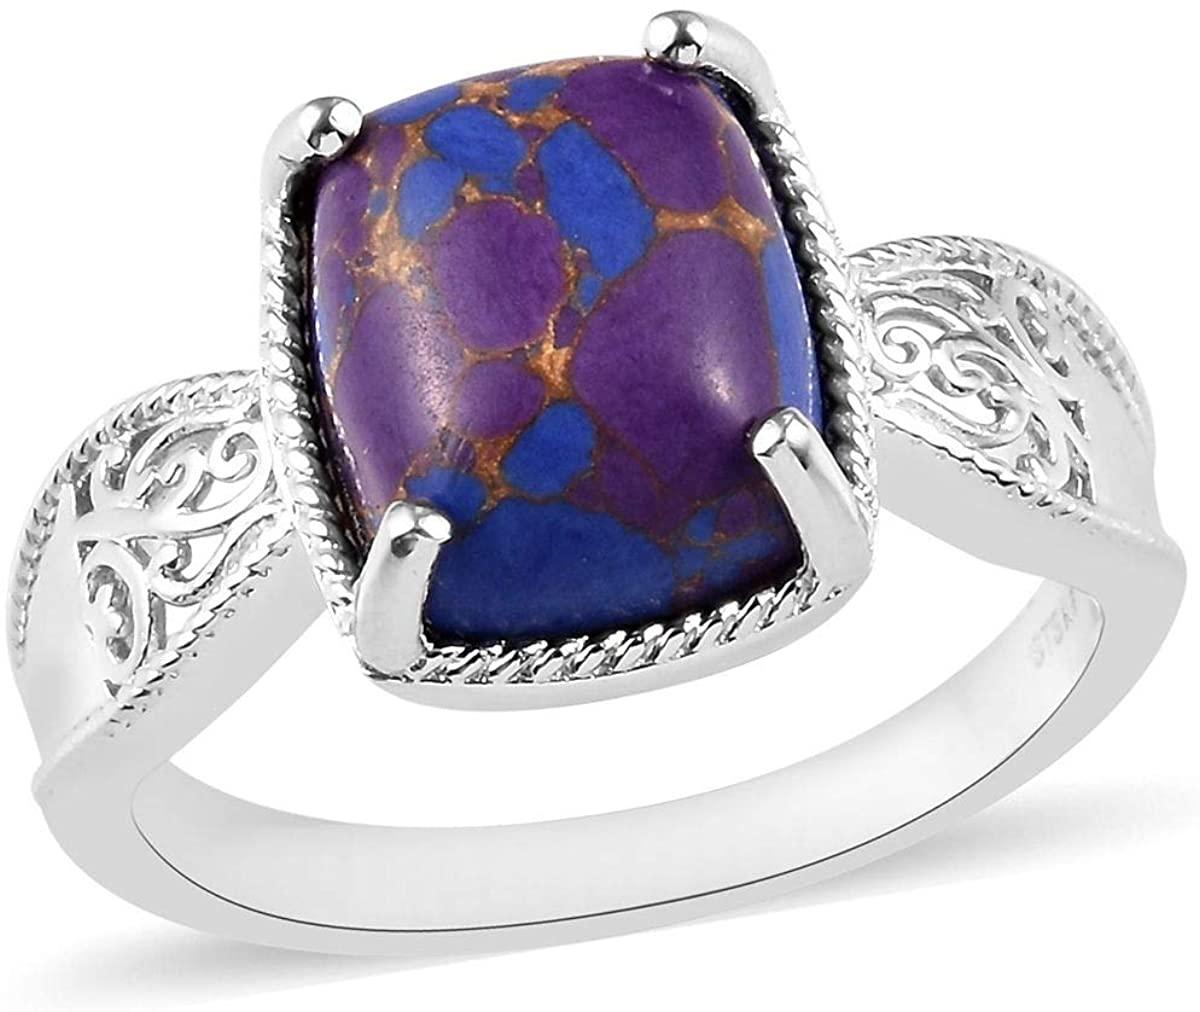 Shop LC Delivering Joy Karis Platinum Plated Cushion Purple Turquoise Solitaire Ring Costume Unique Fashion Jewelry for Women Size 8